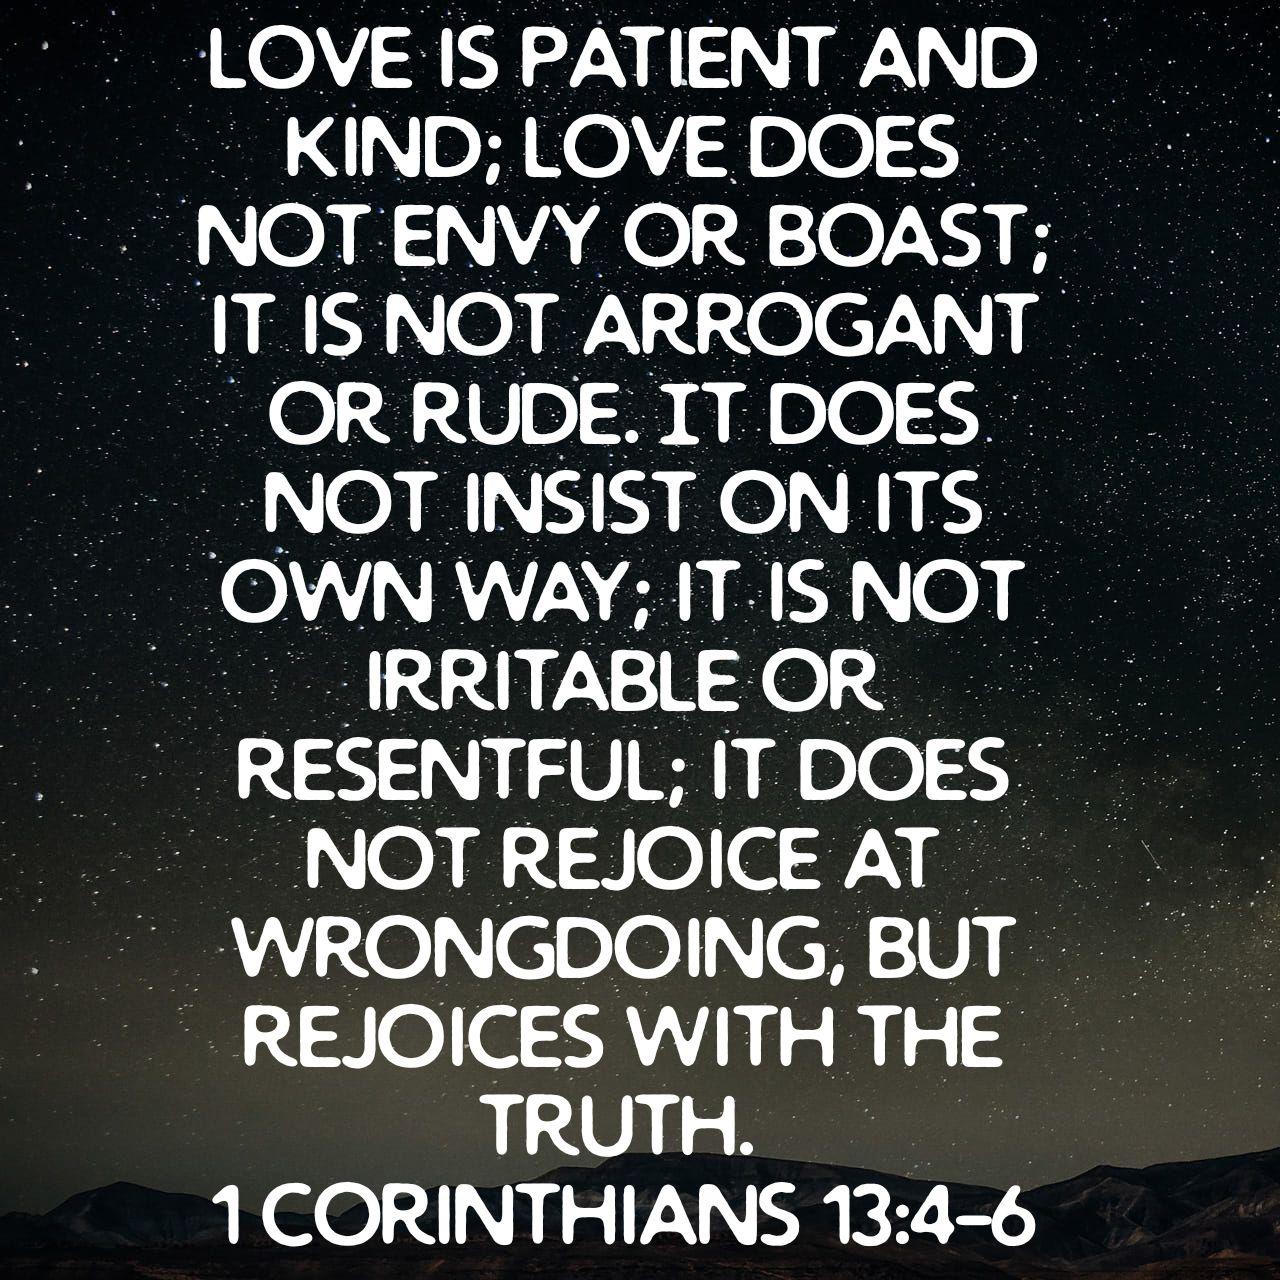 1 Corinthians 13:4-6 ESV